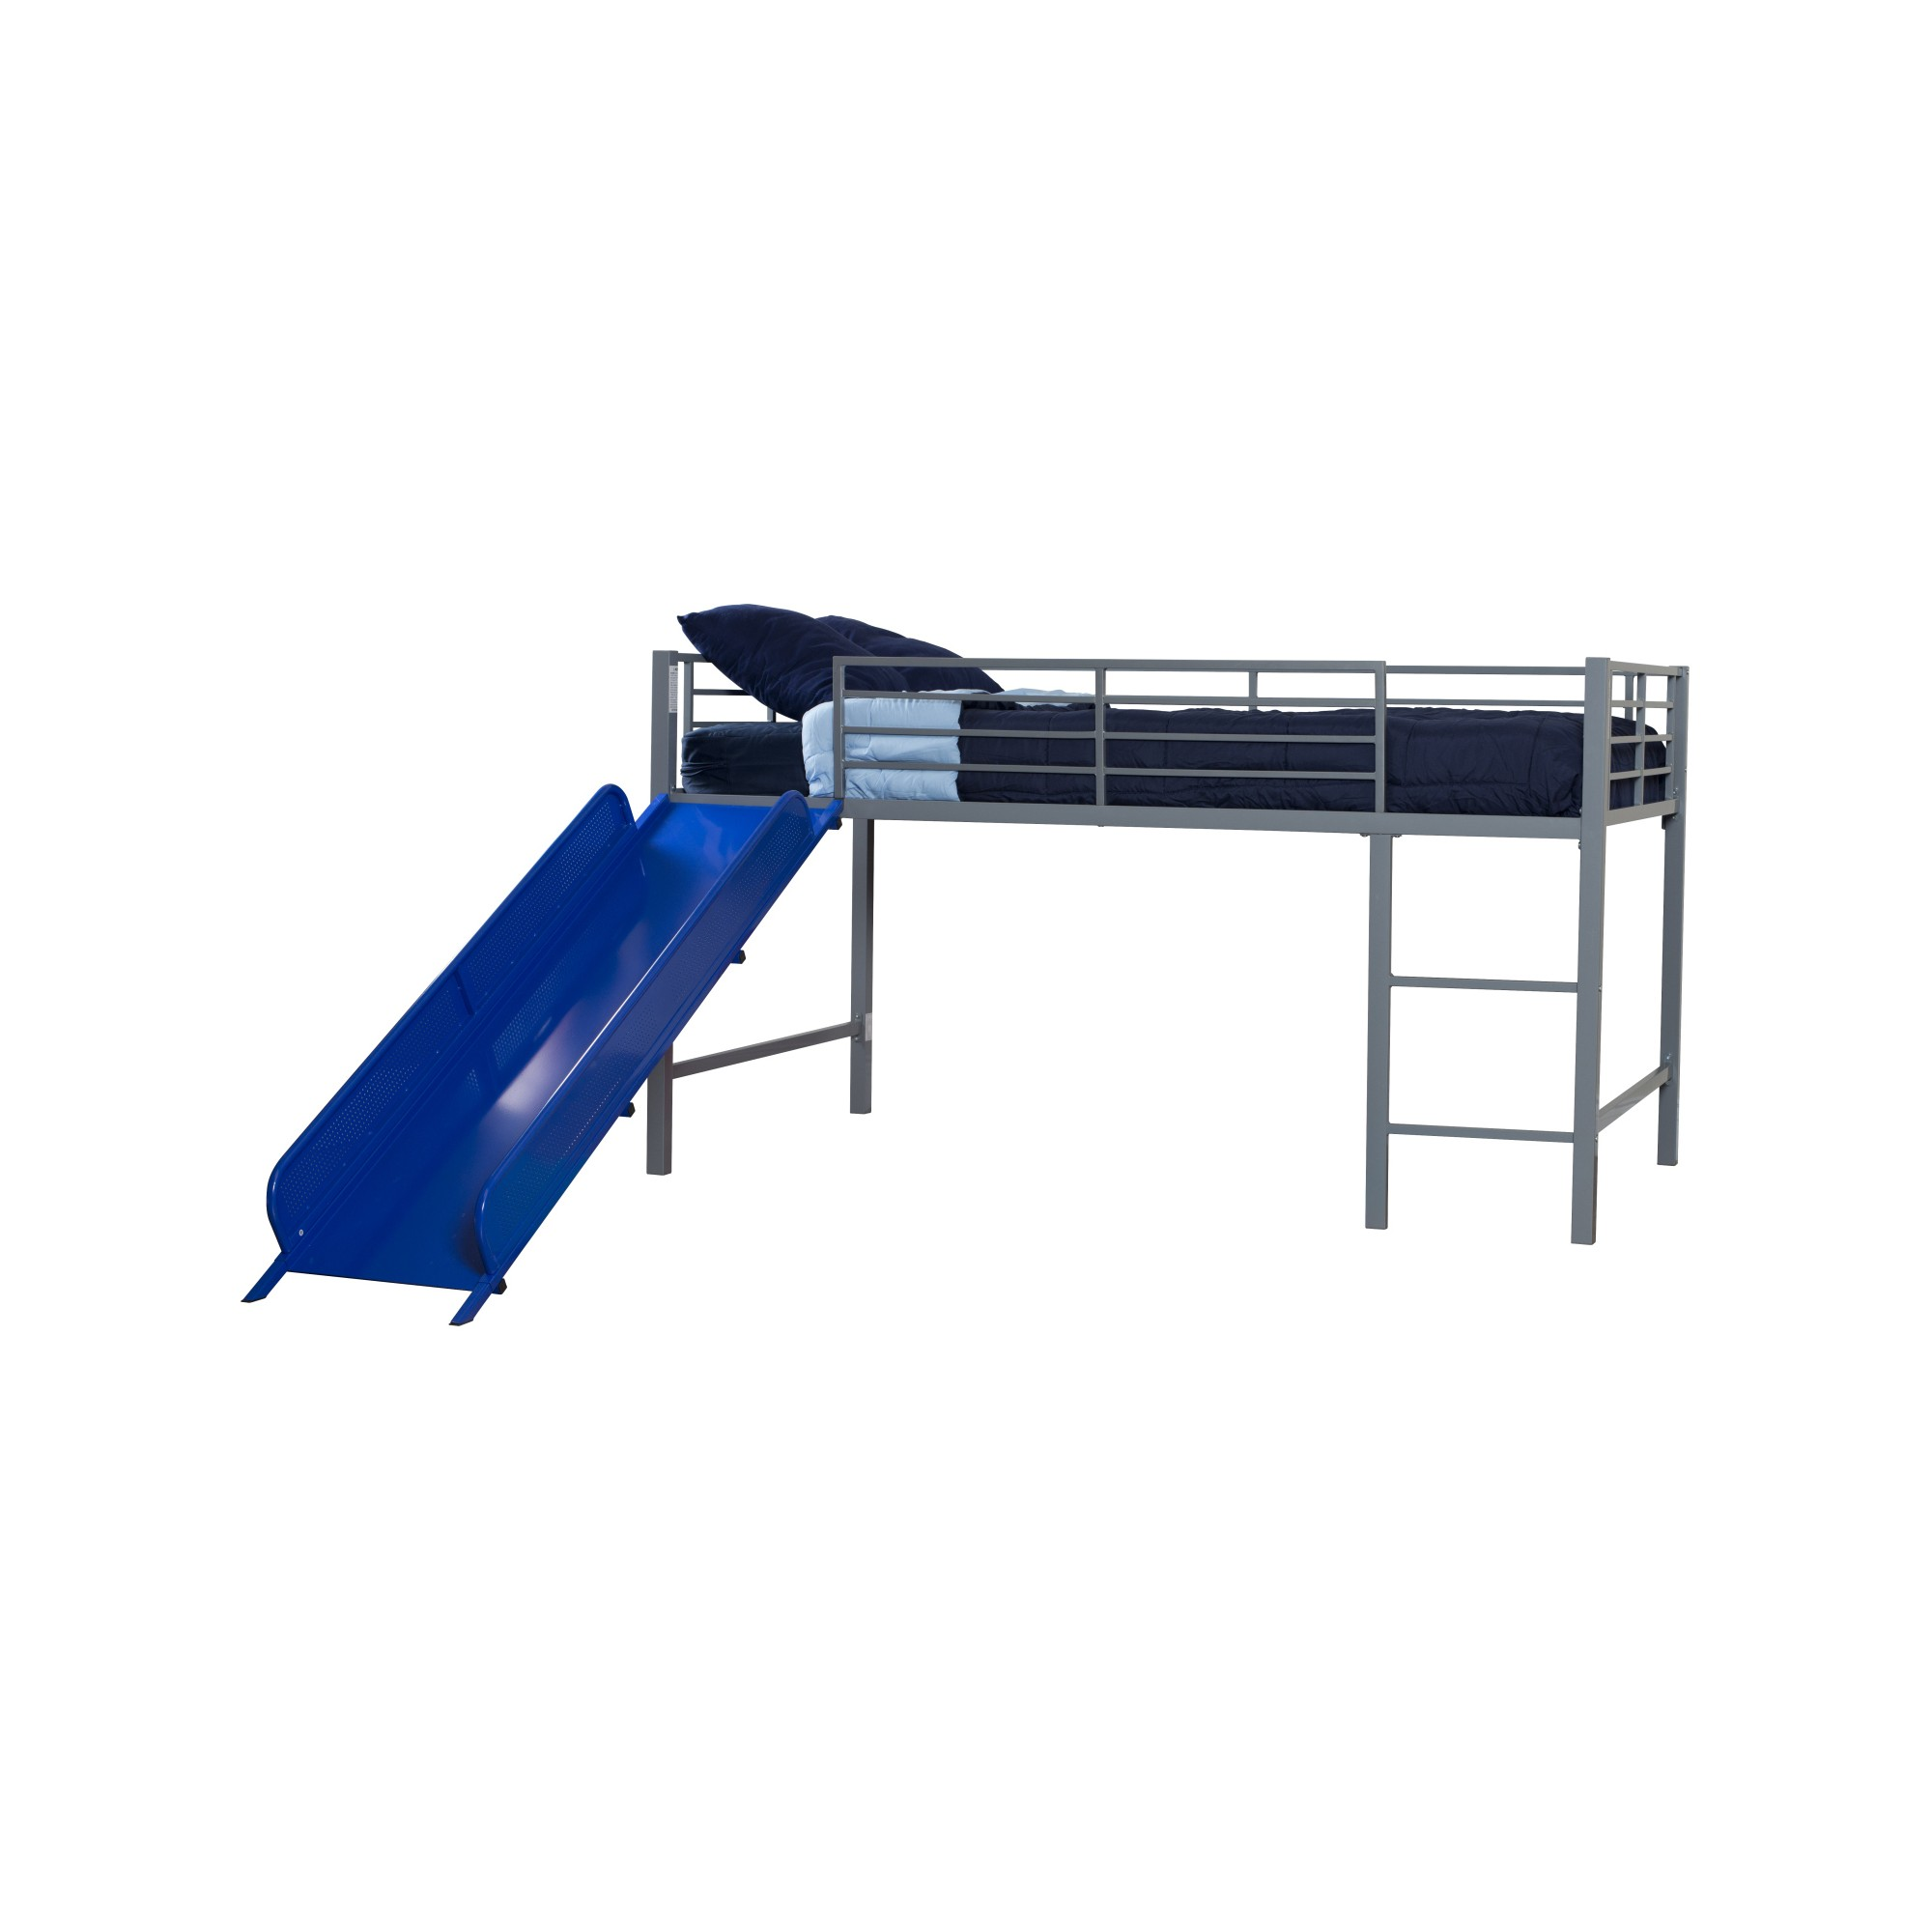 Melia Junior Metal Loft Bed with Slide Silver/Blue - Room & Joy